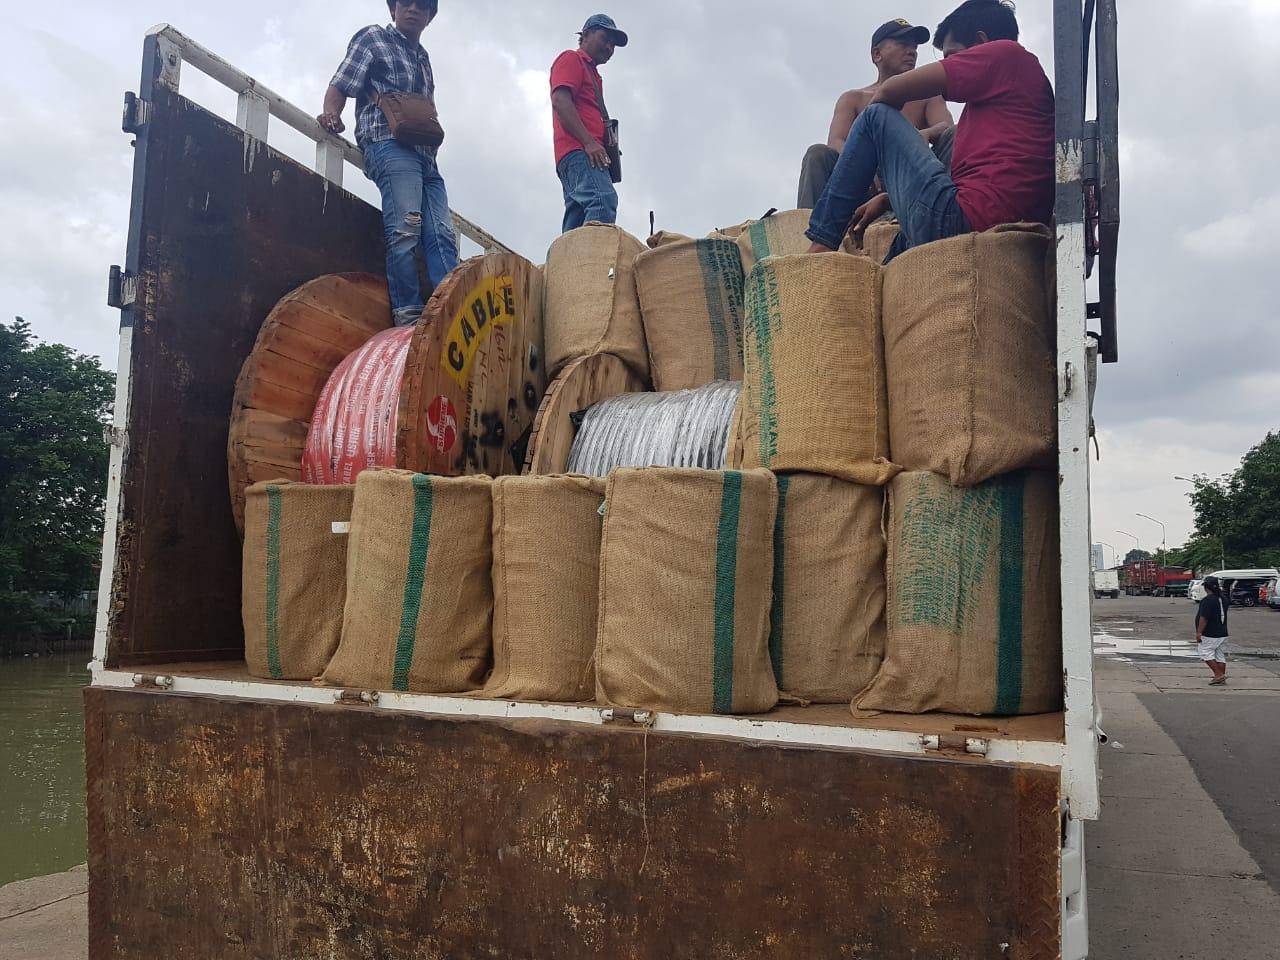 Pengiriman Barang Via Kapal Laut Surabaya 2019